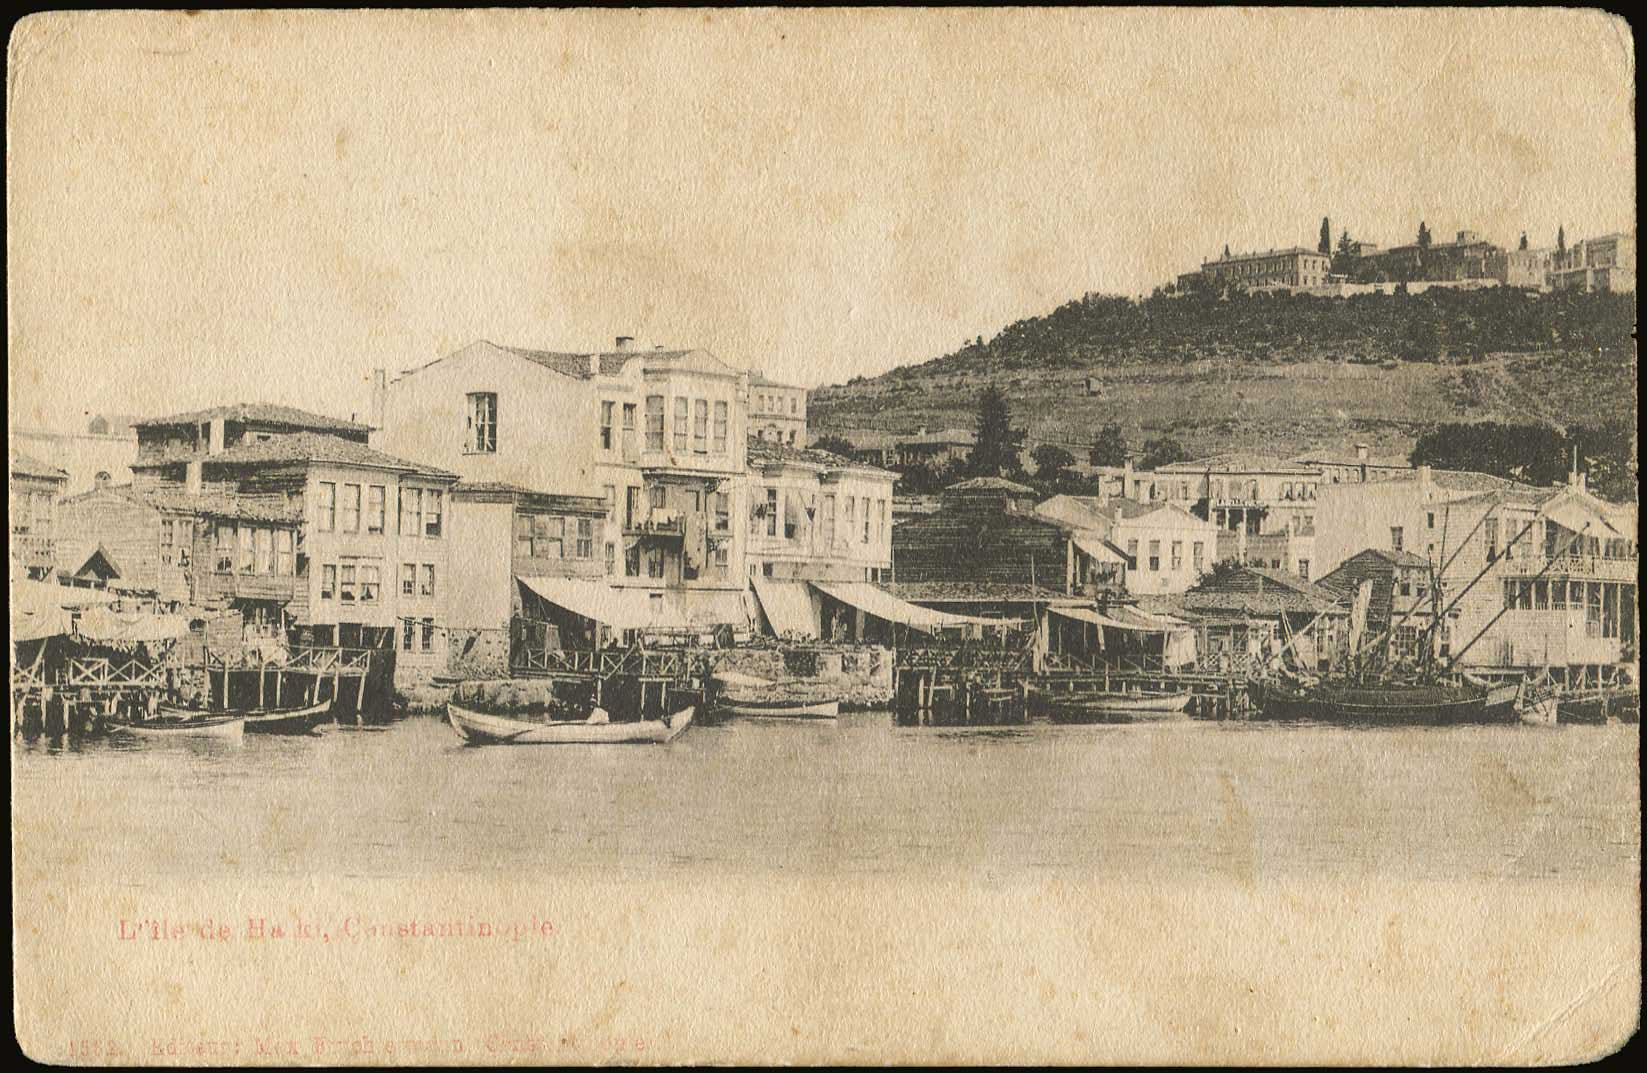 Lot 1569 - picture postcards SMYRNE, CONSTANTINOPLE, ASIA MINOR -  A. Karamitsos Postal & Live Internet Auction 680 General Philatelic Auction